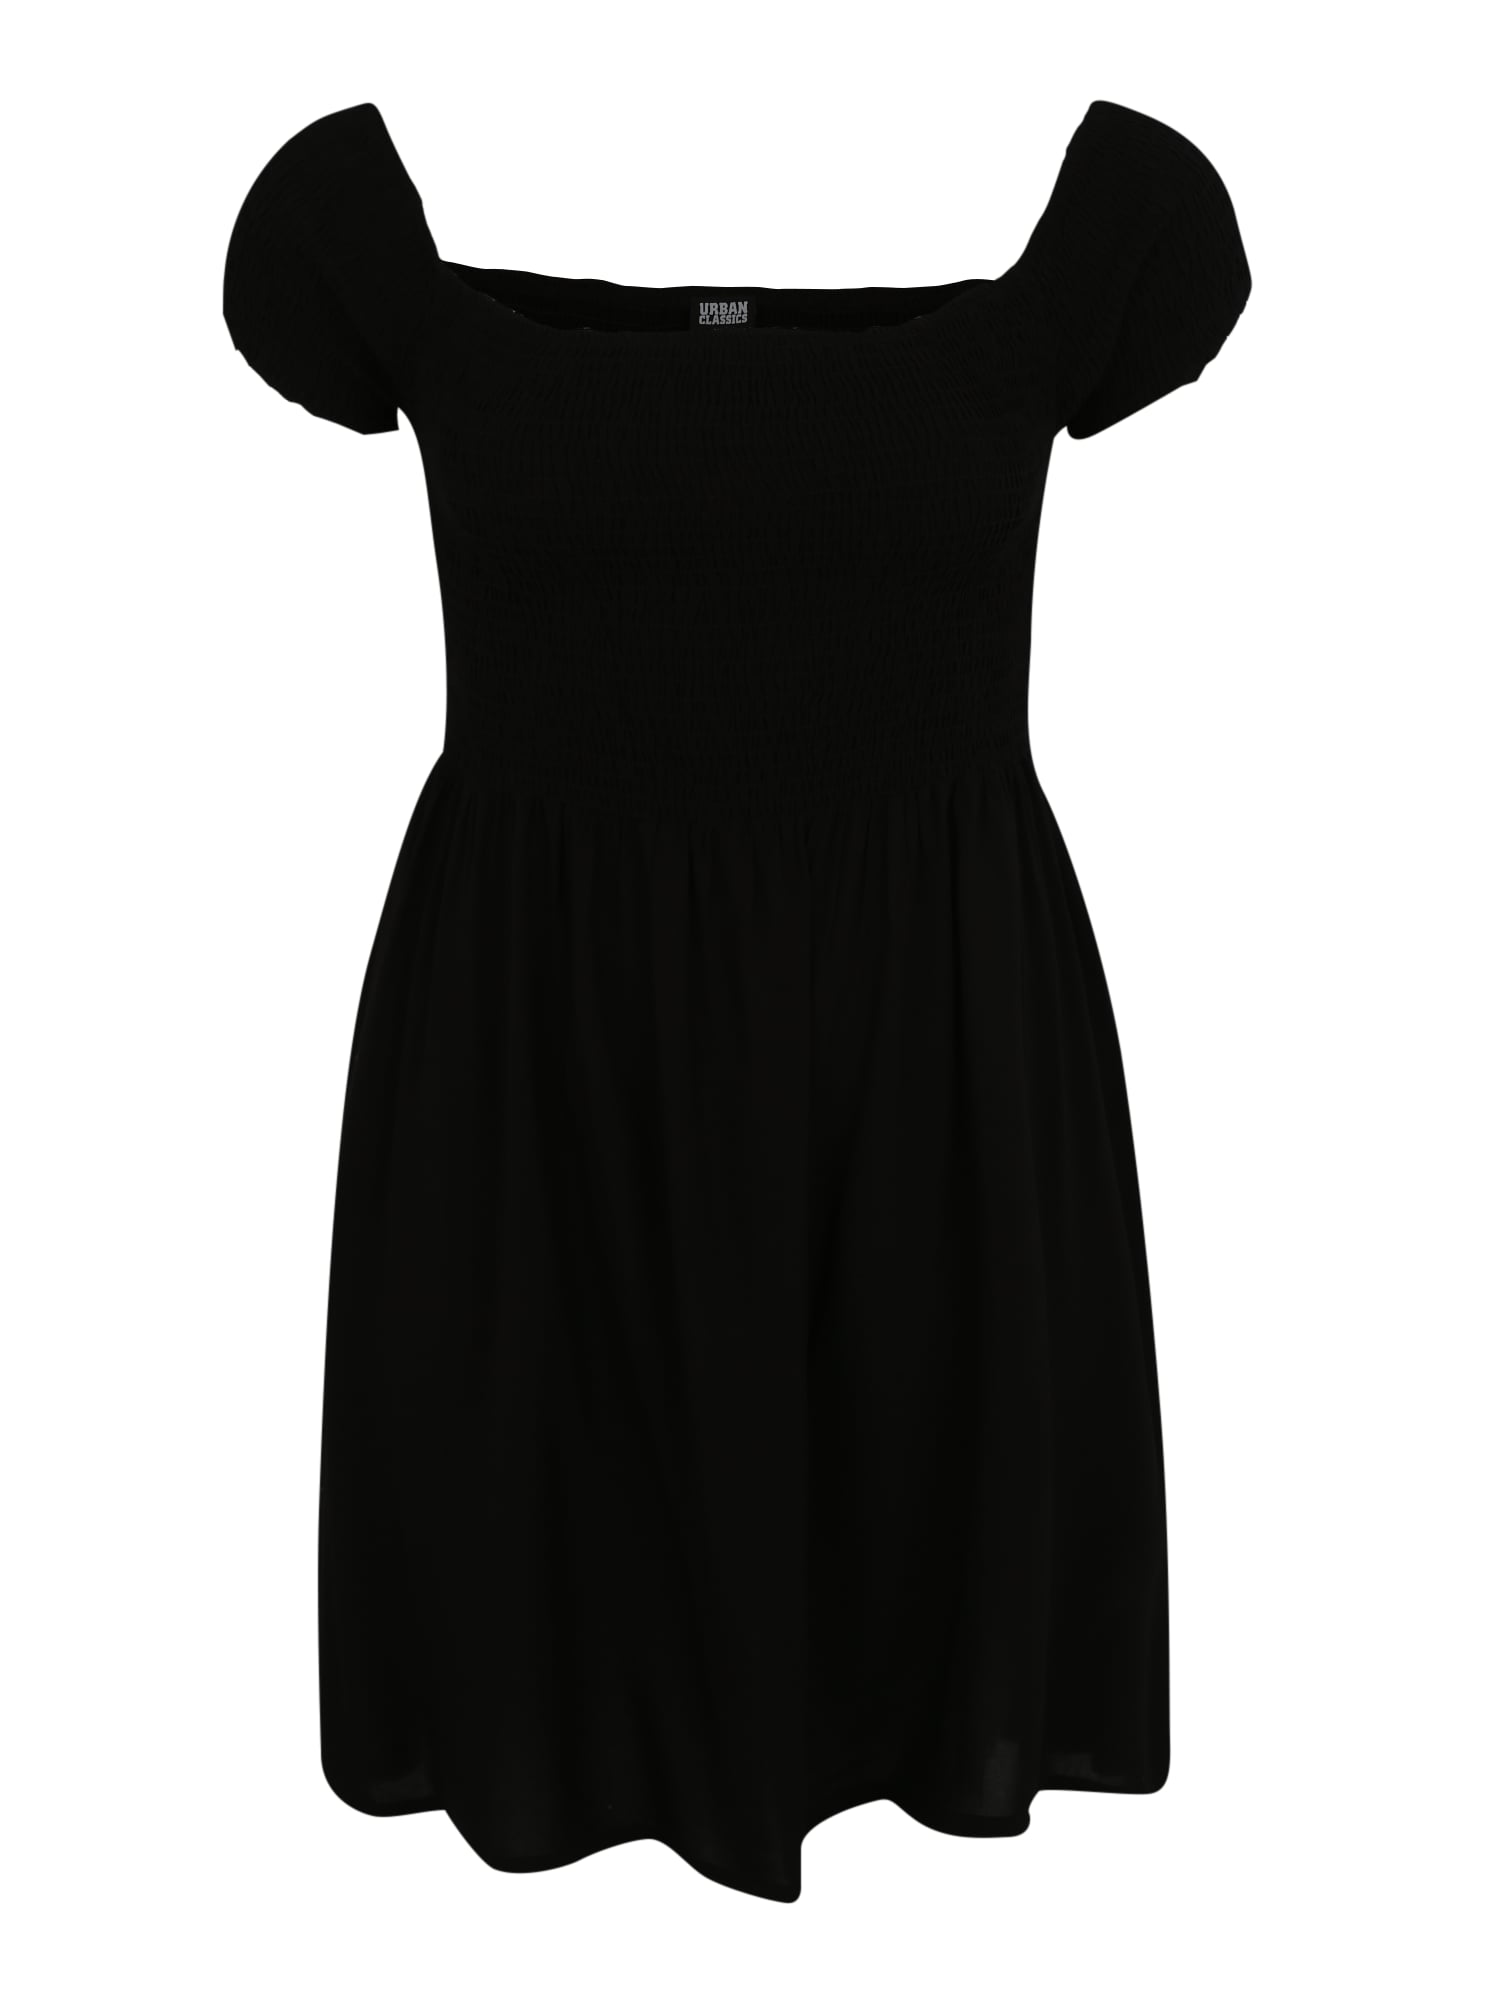 Šaty Smoked černá Urban Classics Curvy